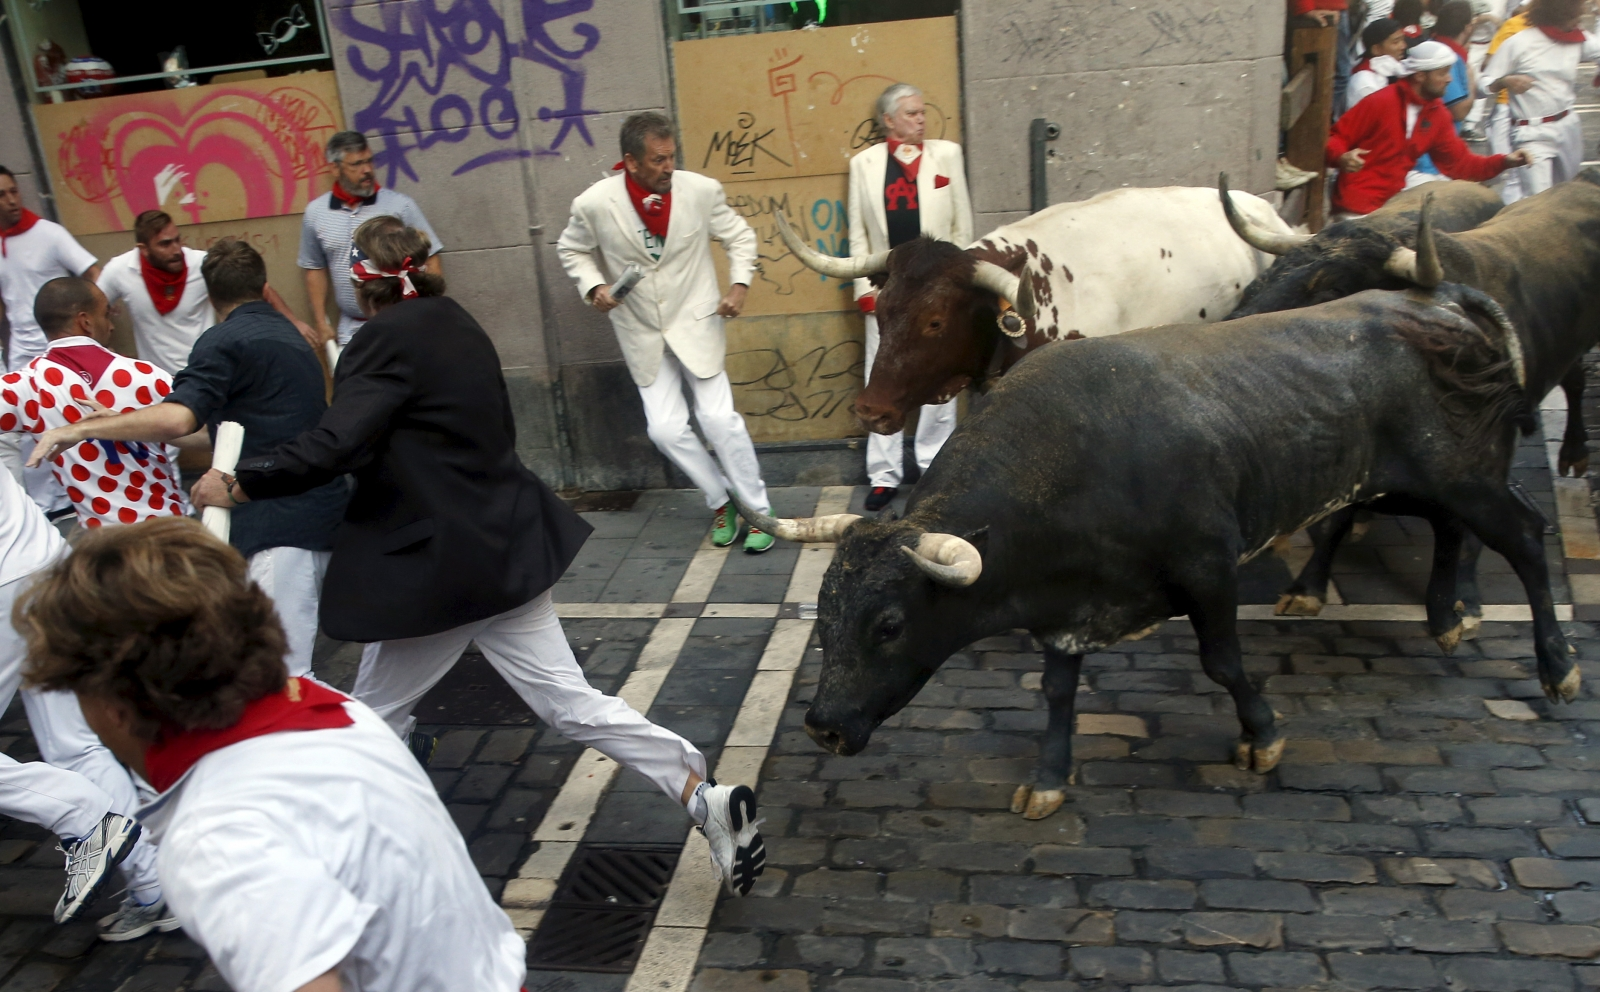 Spanish Bull Run Deaths Death Toll From Bull-running